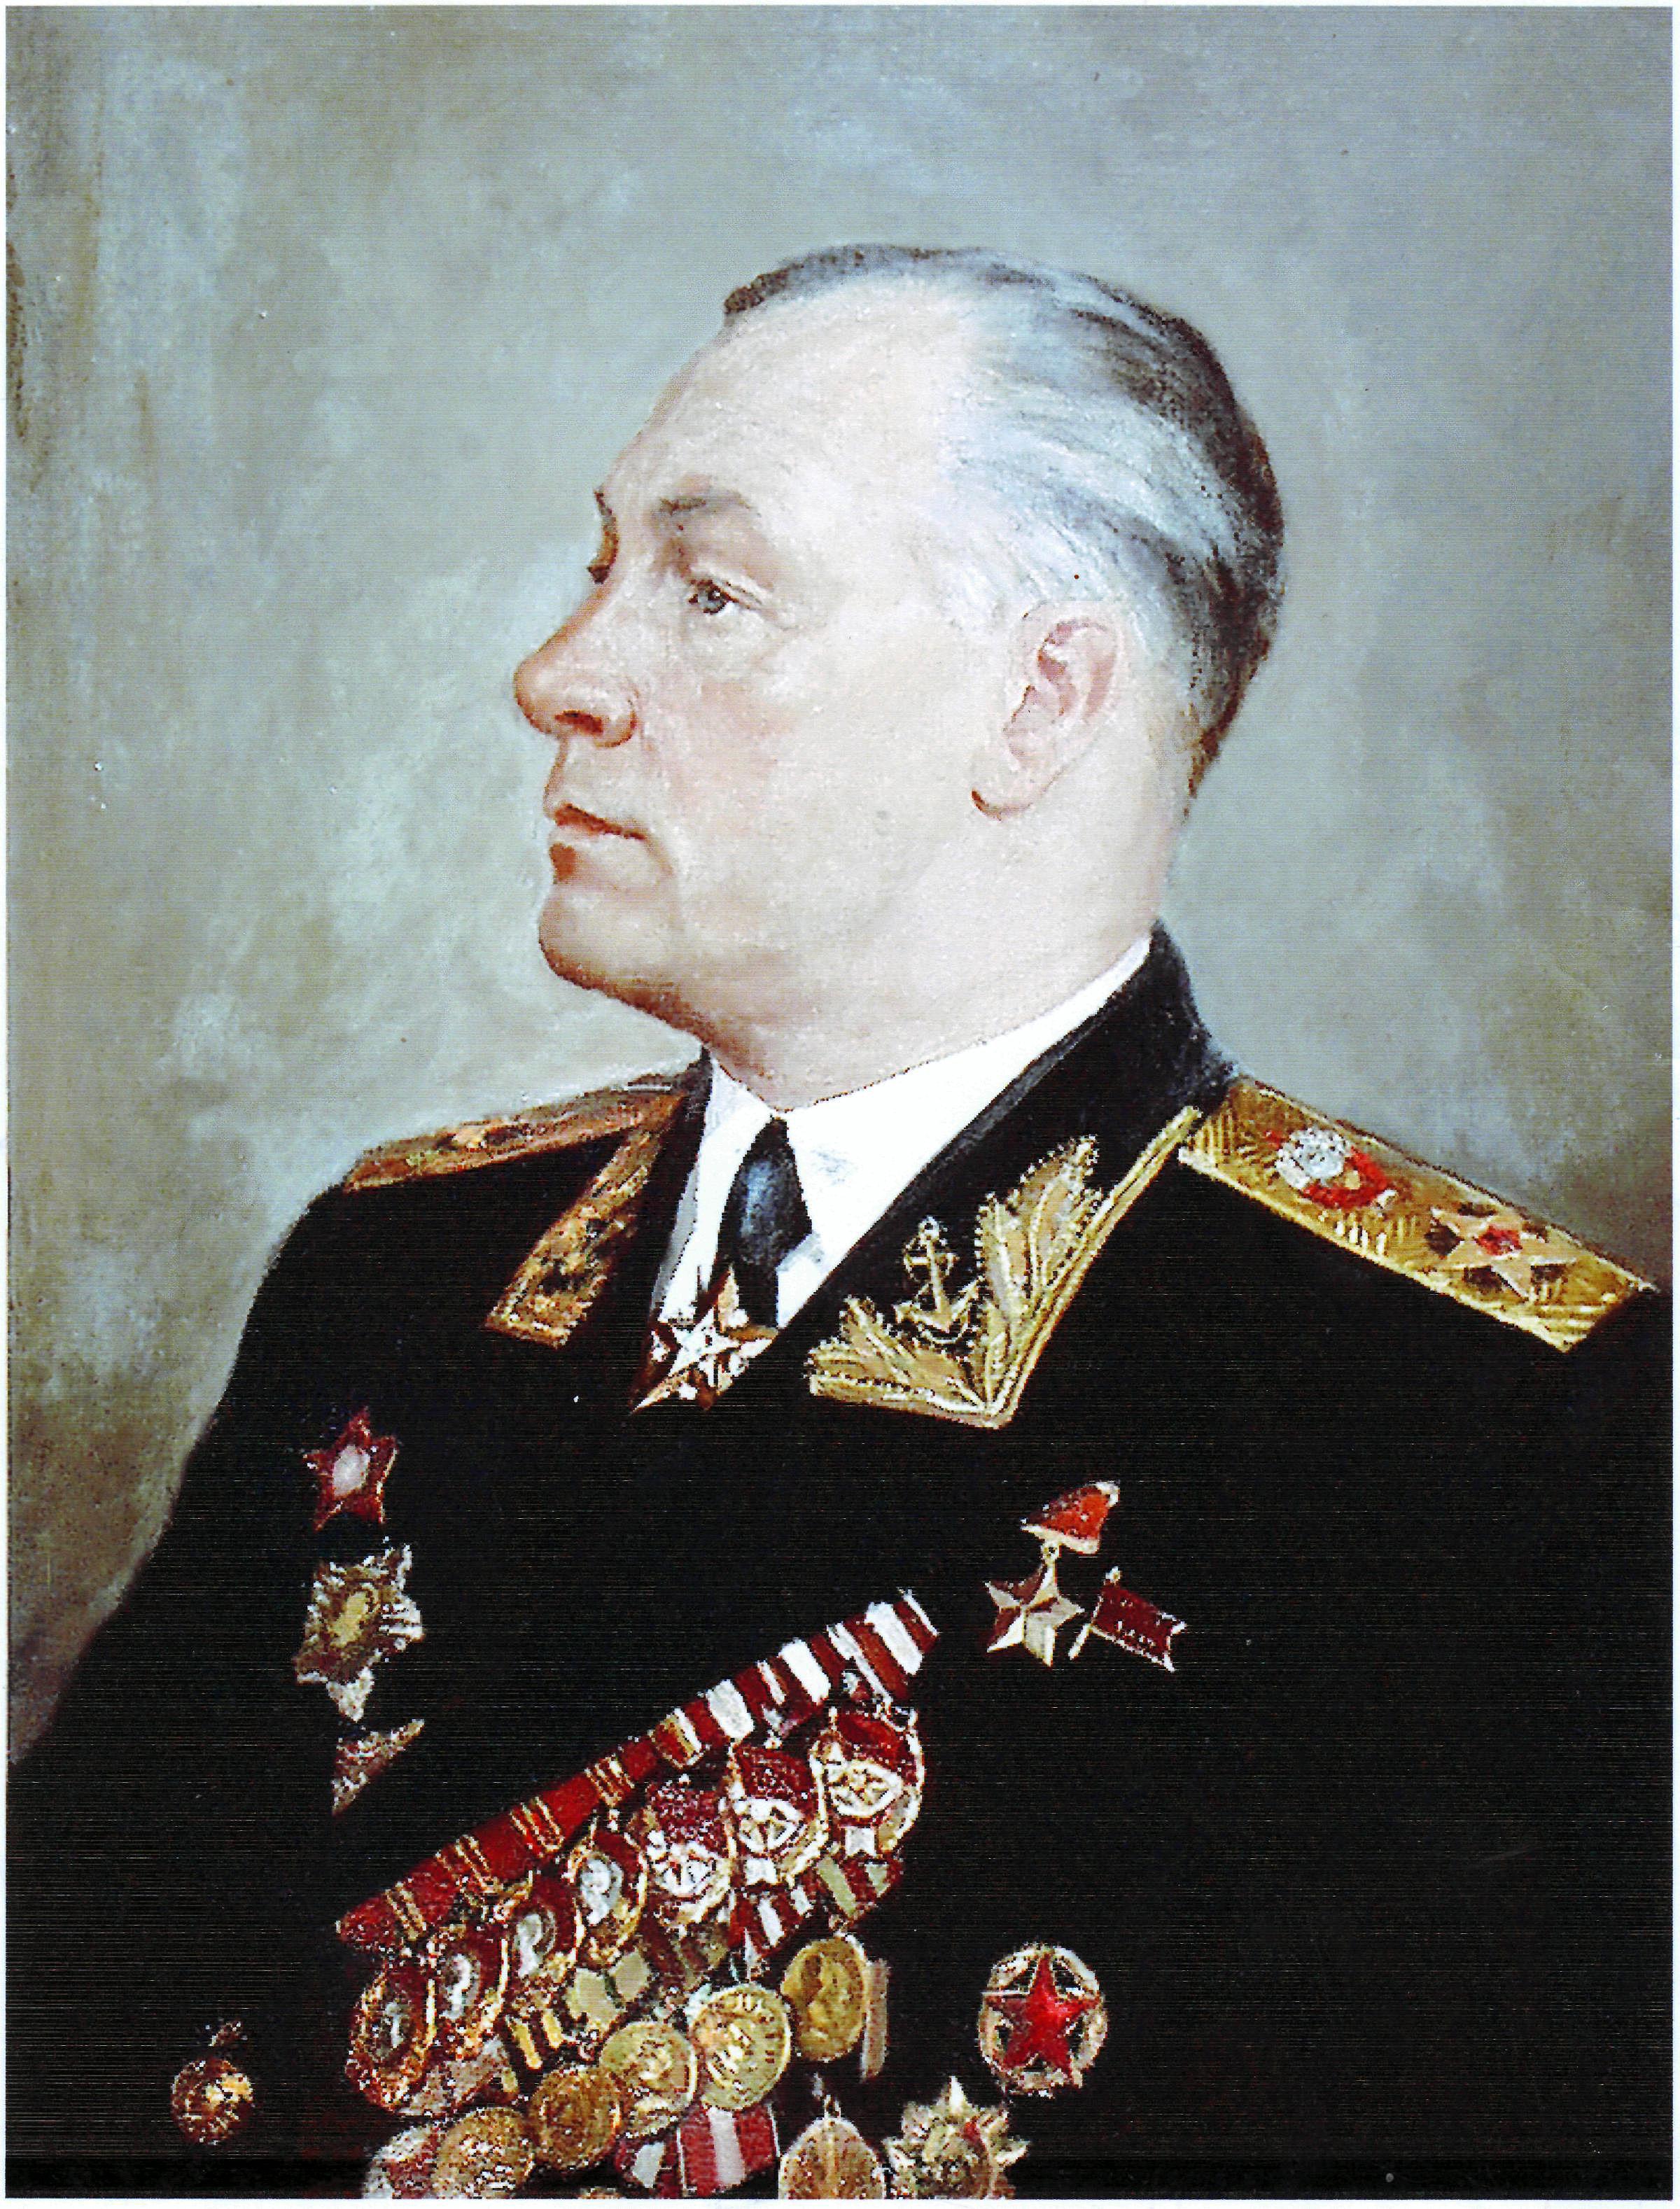 Адмирал Флота Советского Союза Николай Герасимович Кузнецов